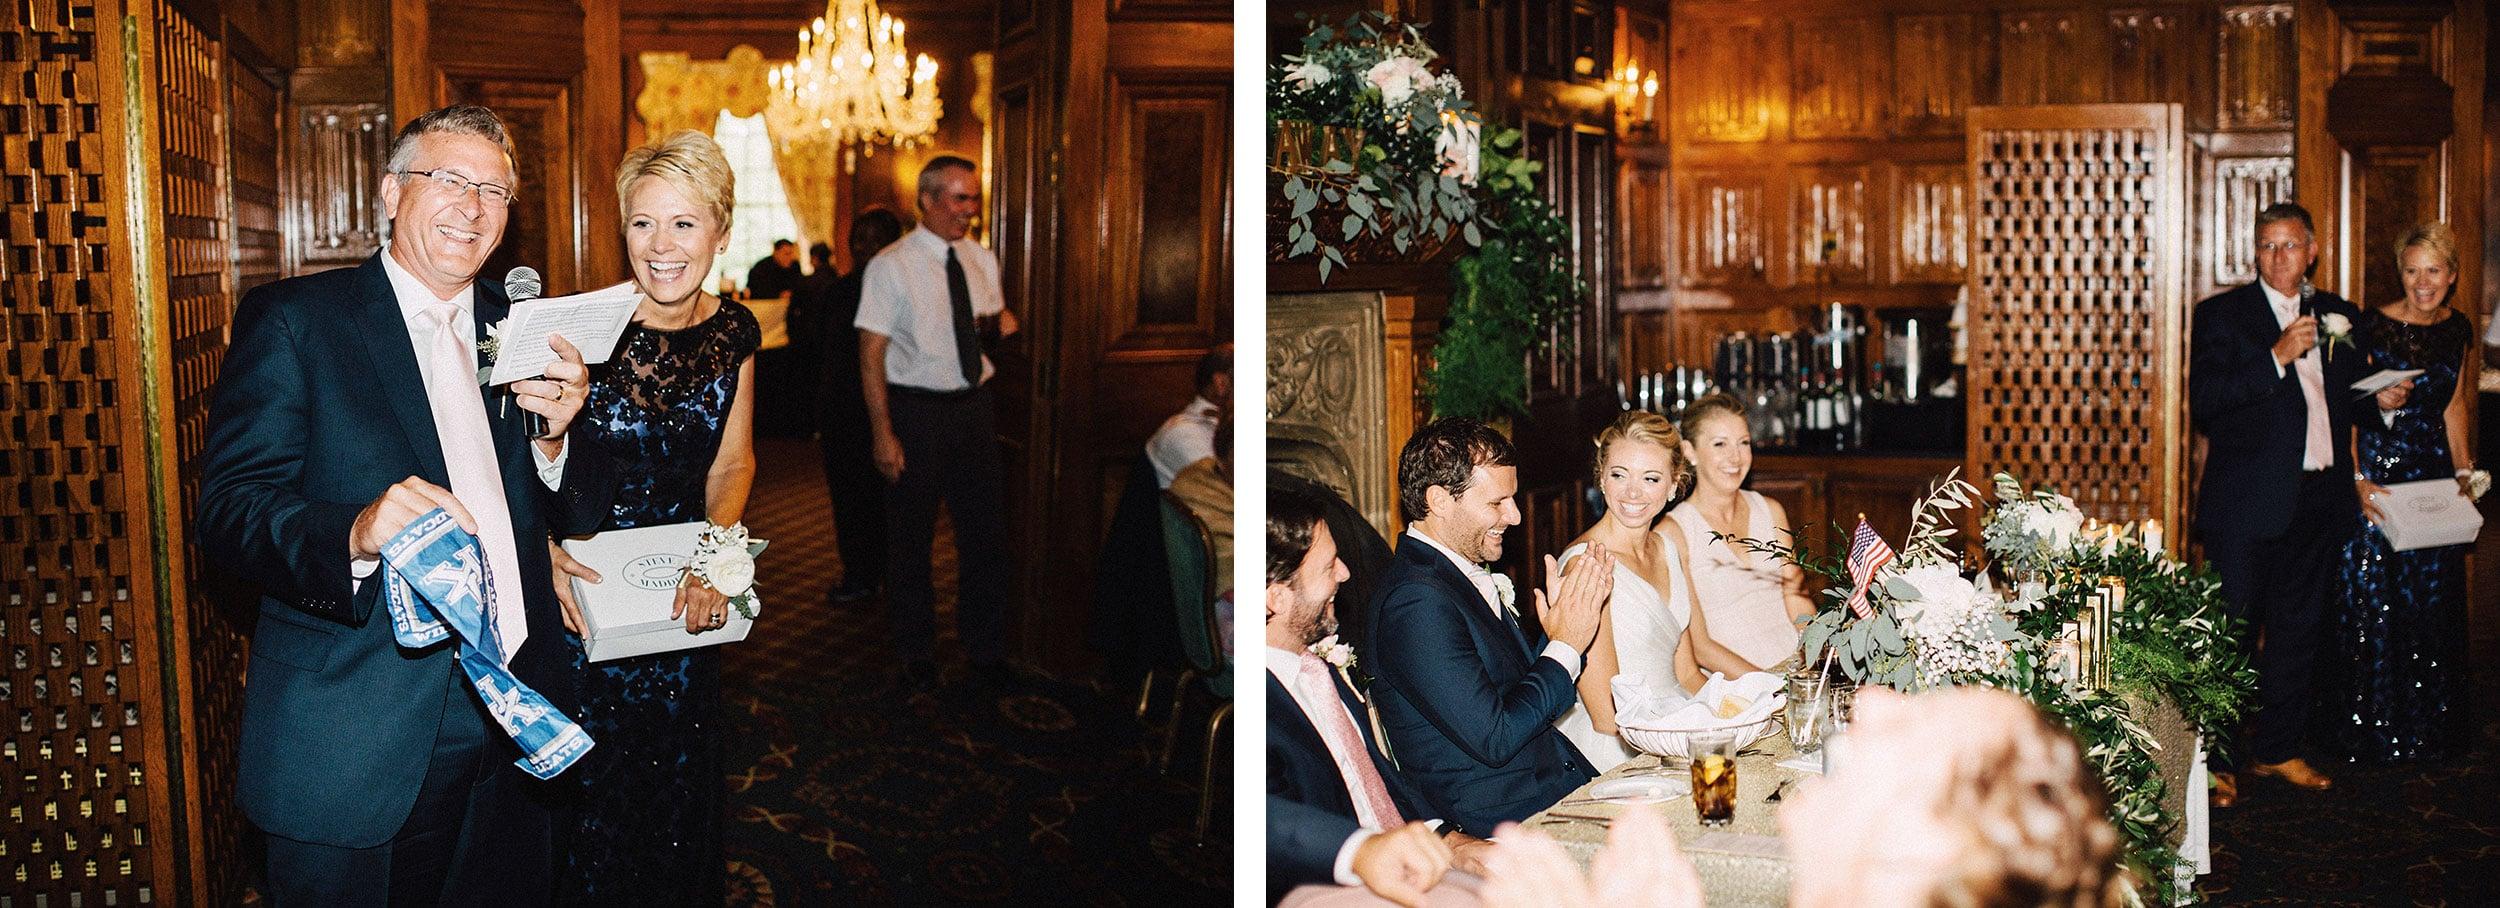 spindletop-lexington-wedding-photographer-036.JPG